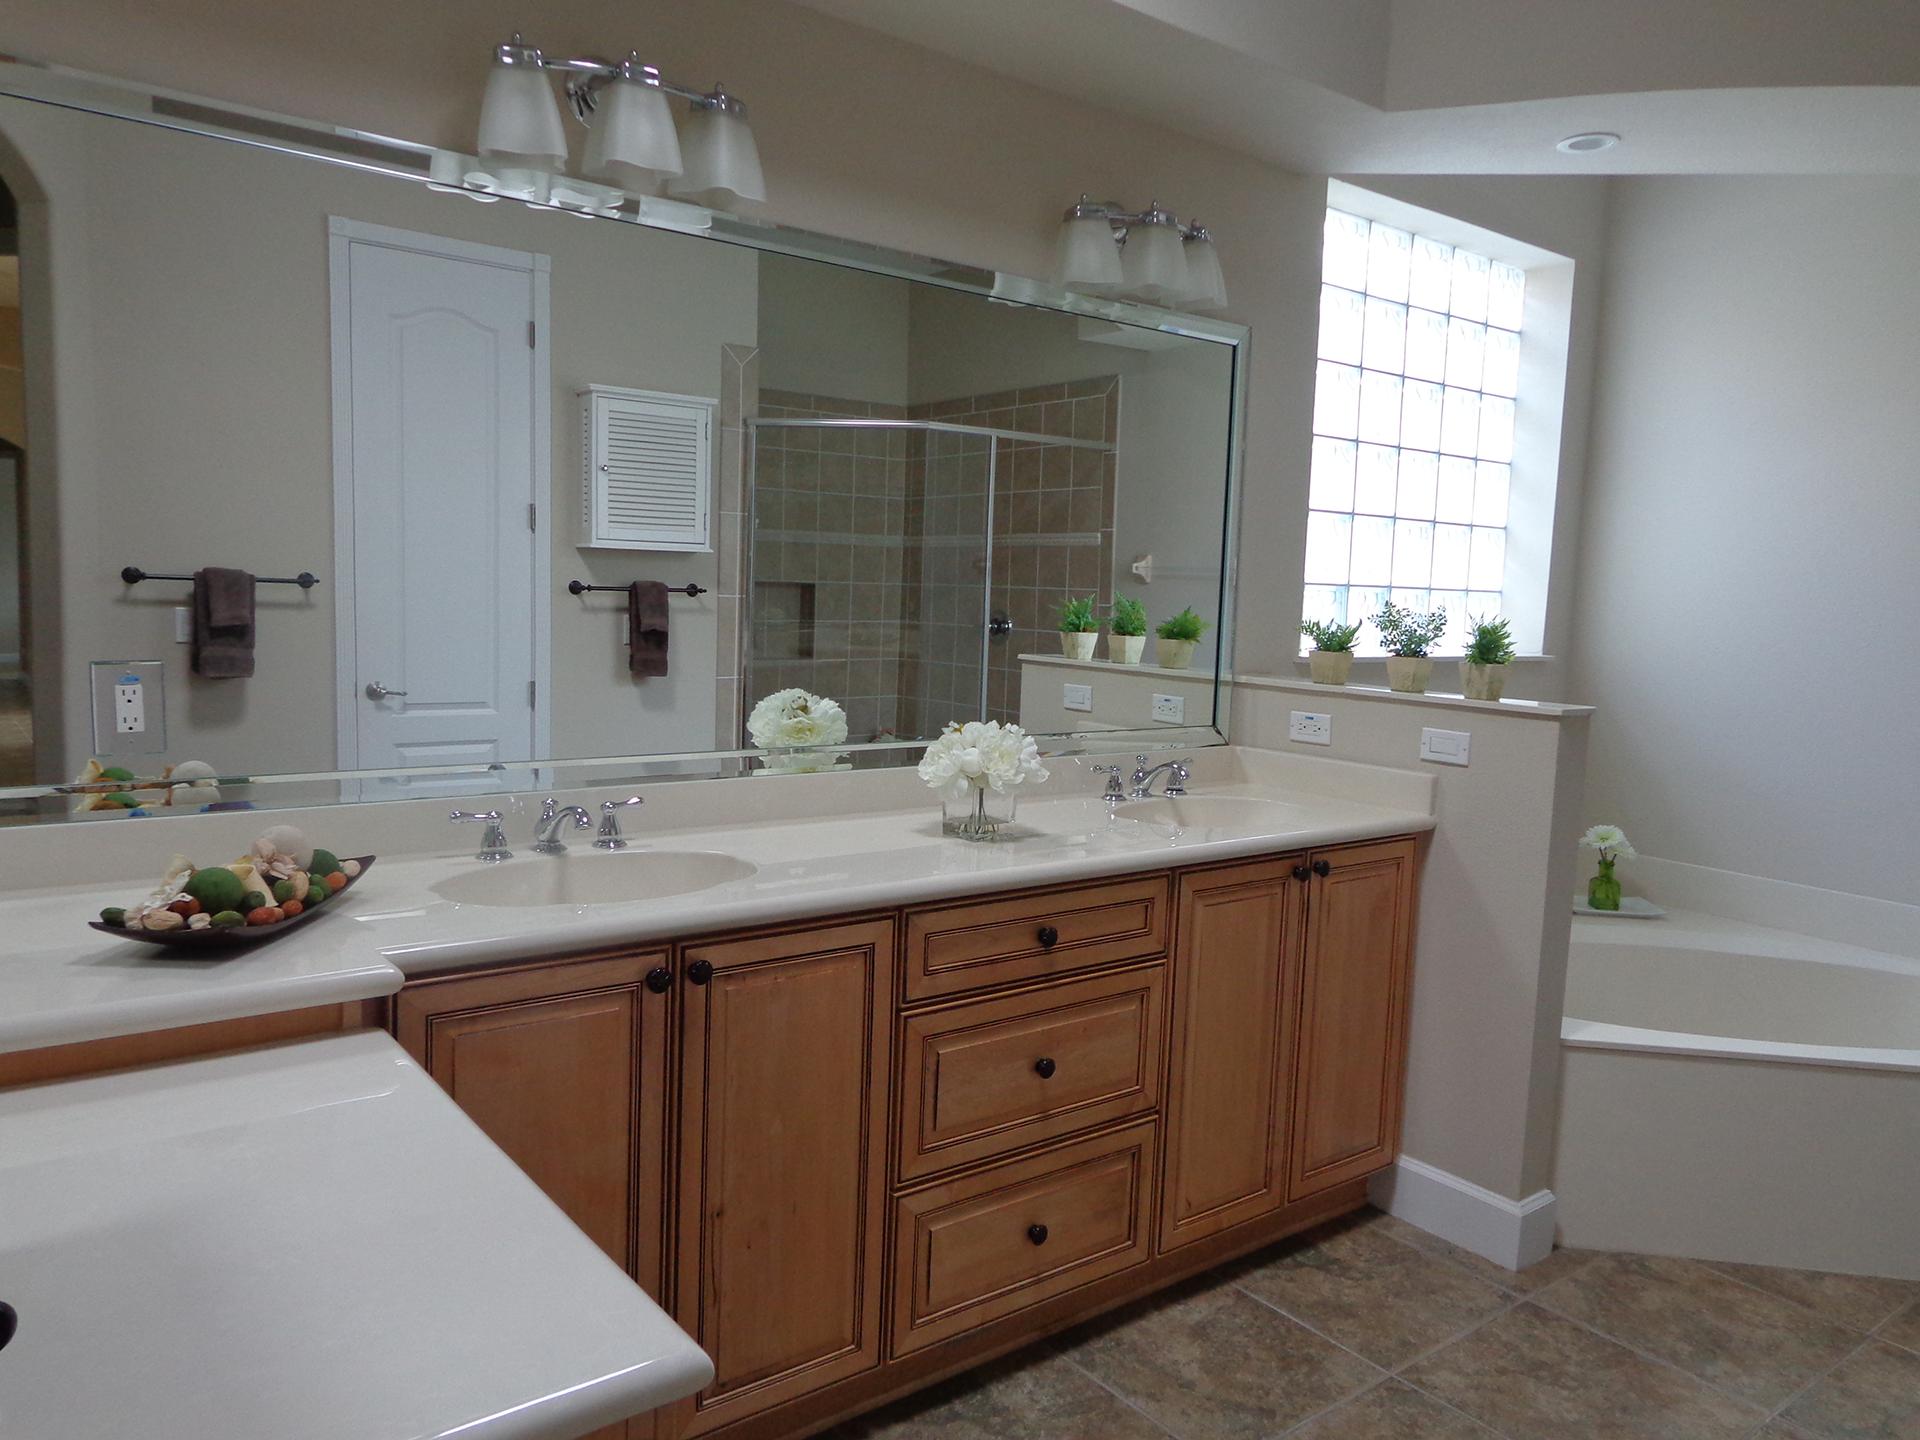 Staged-Assets-Home-Staging-Interior-Design-Palm-Coast-Florida-13